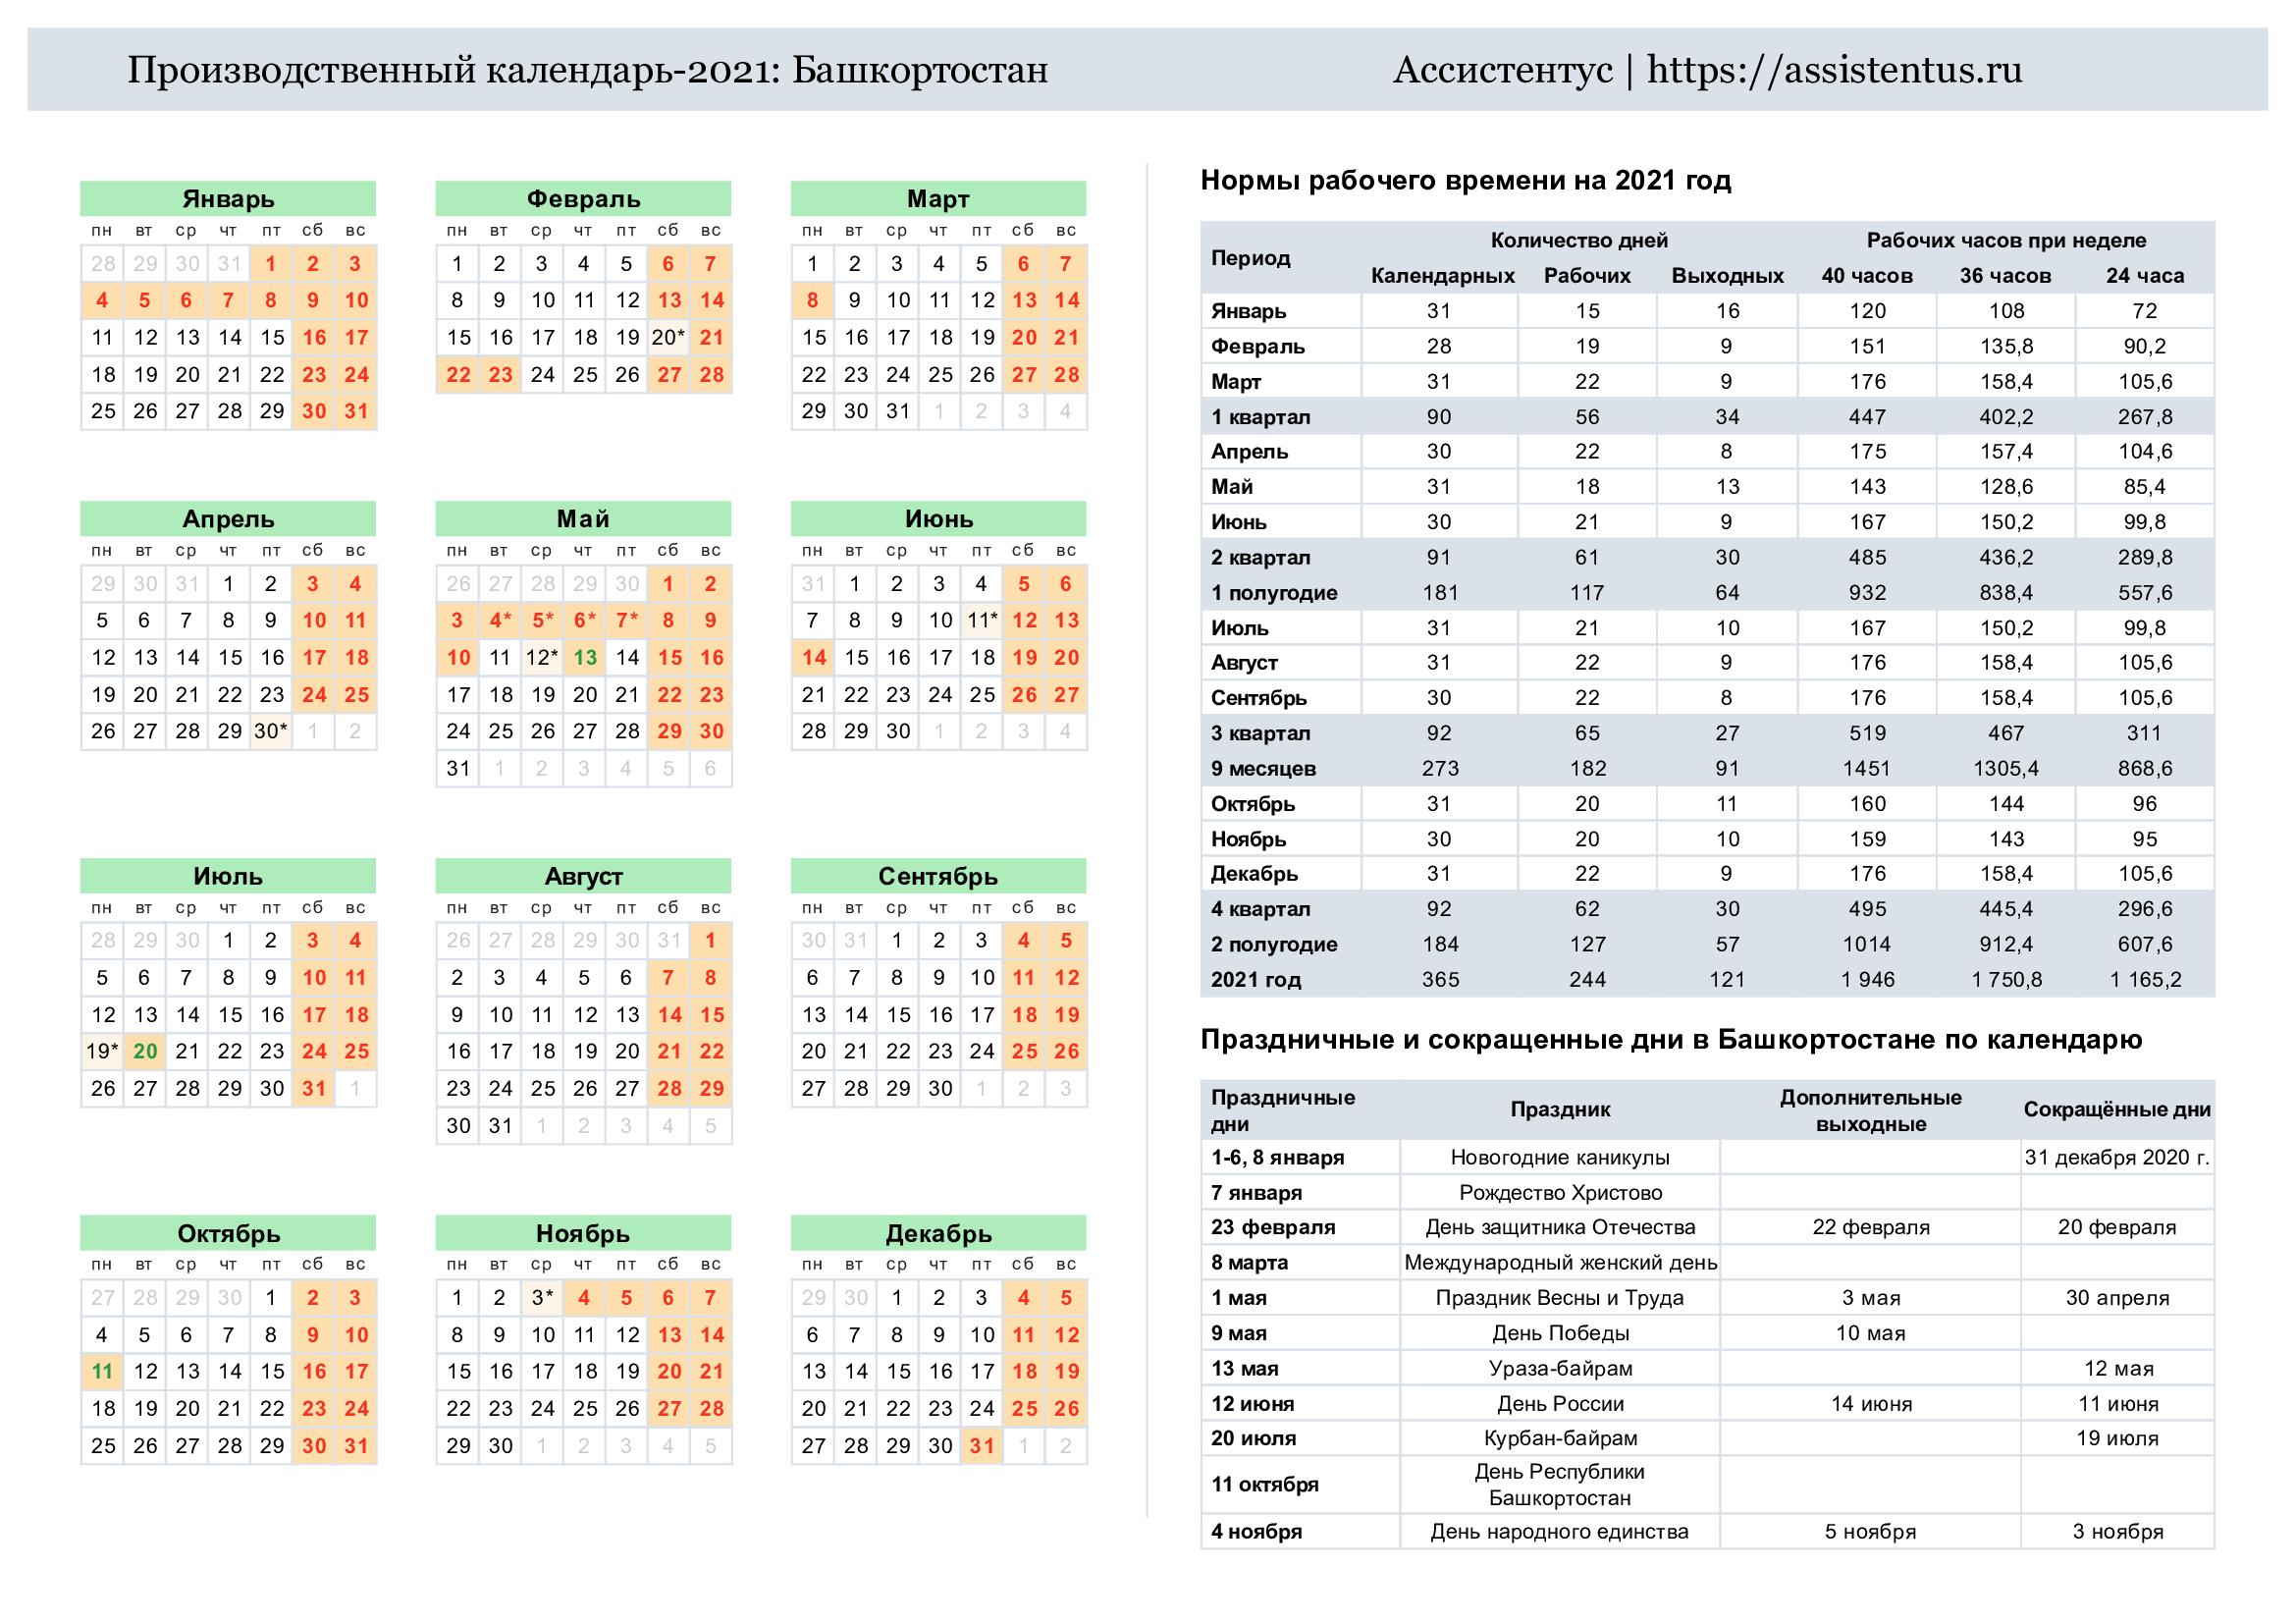 Производственный календарь 2021, Башкортостан